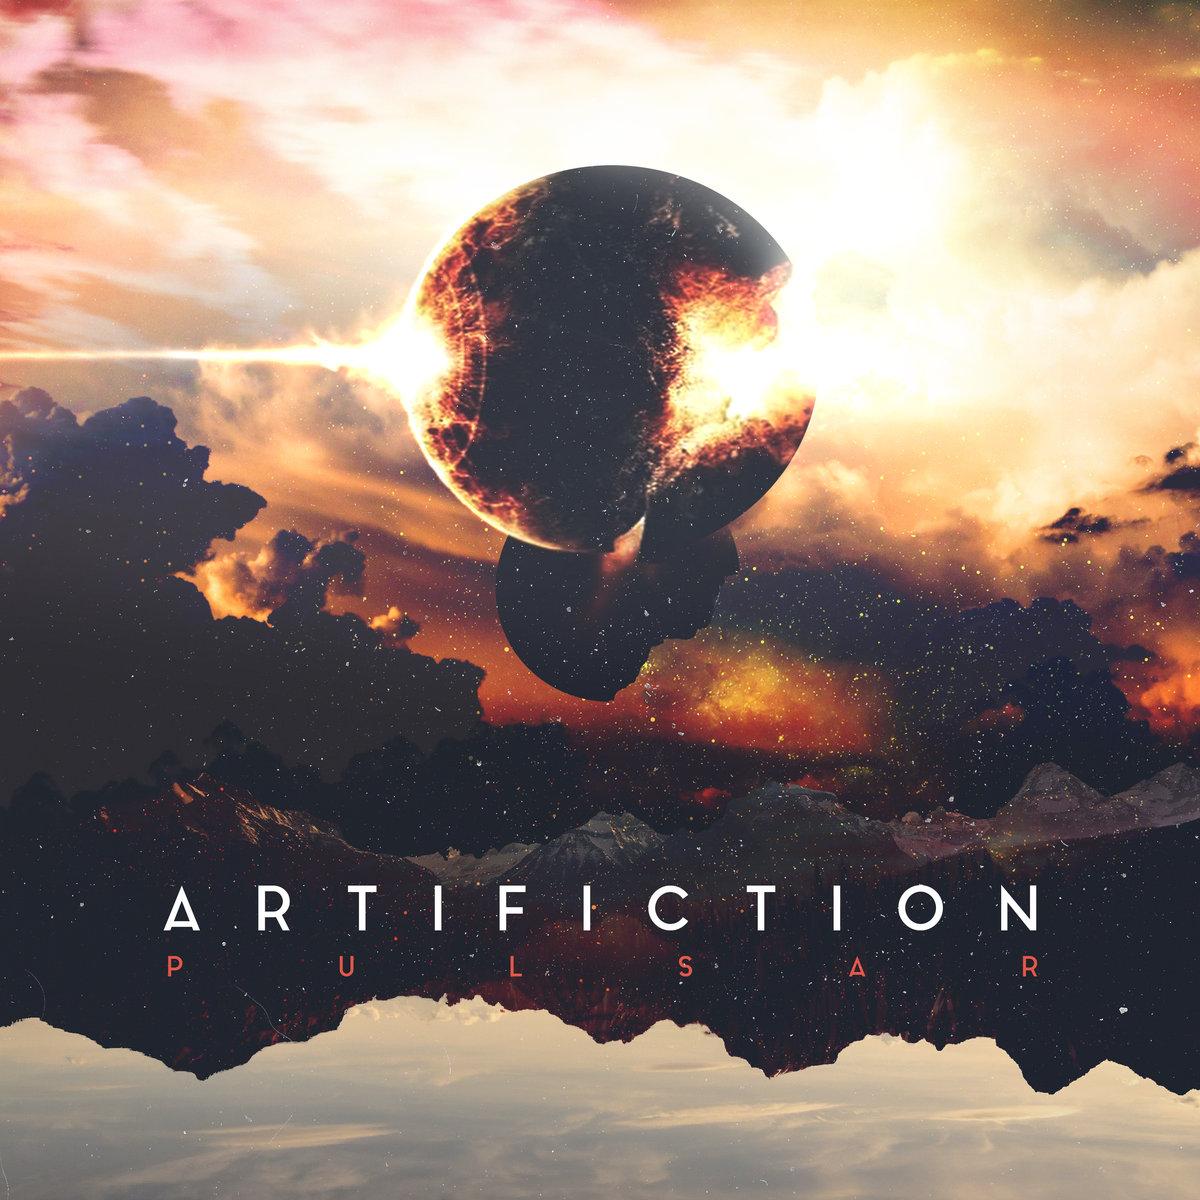 Artifiction - Pulsar [EP] (2018)